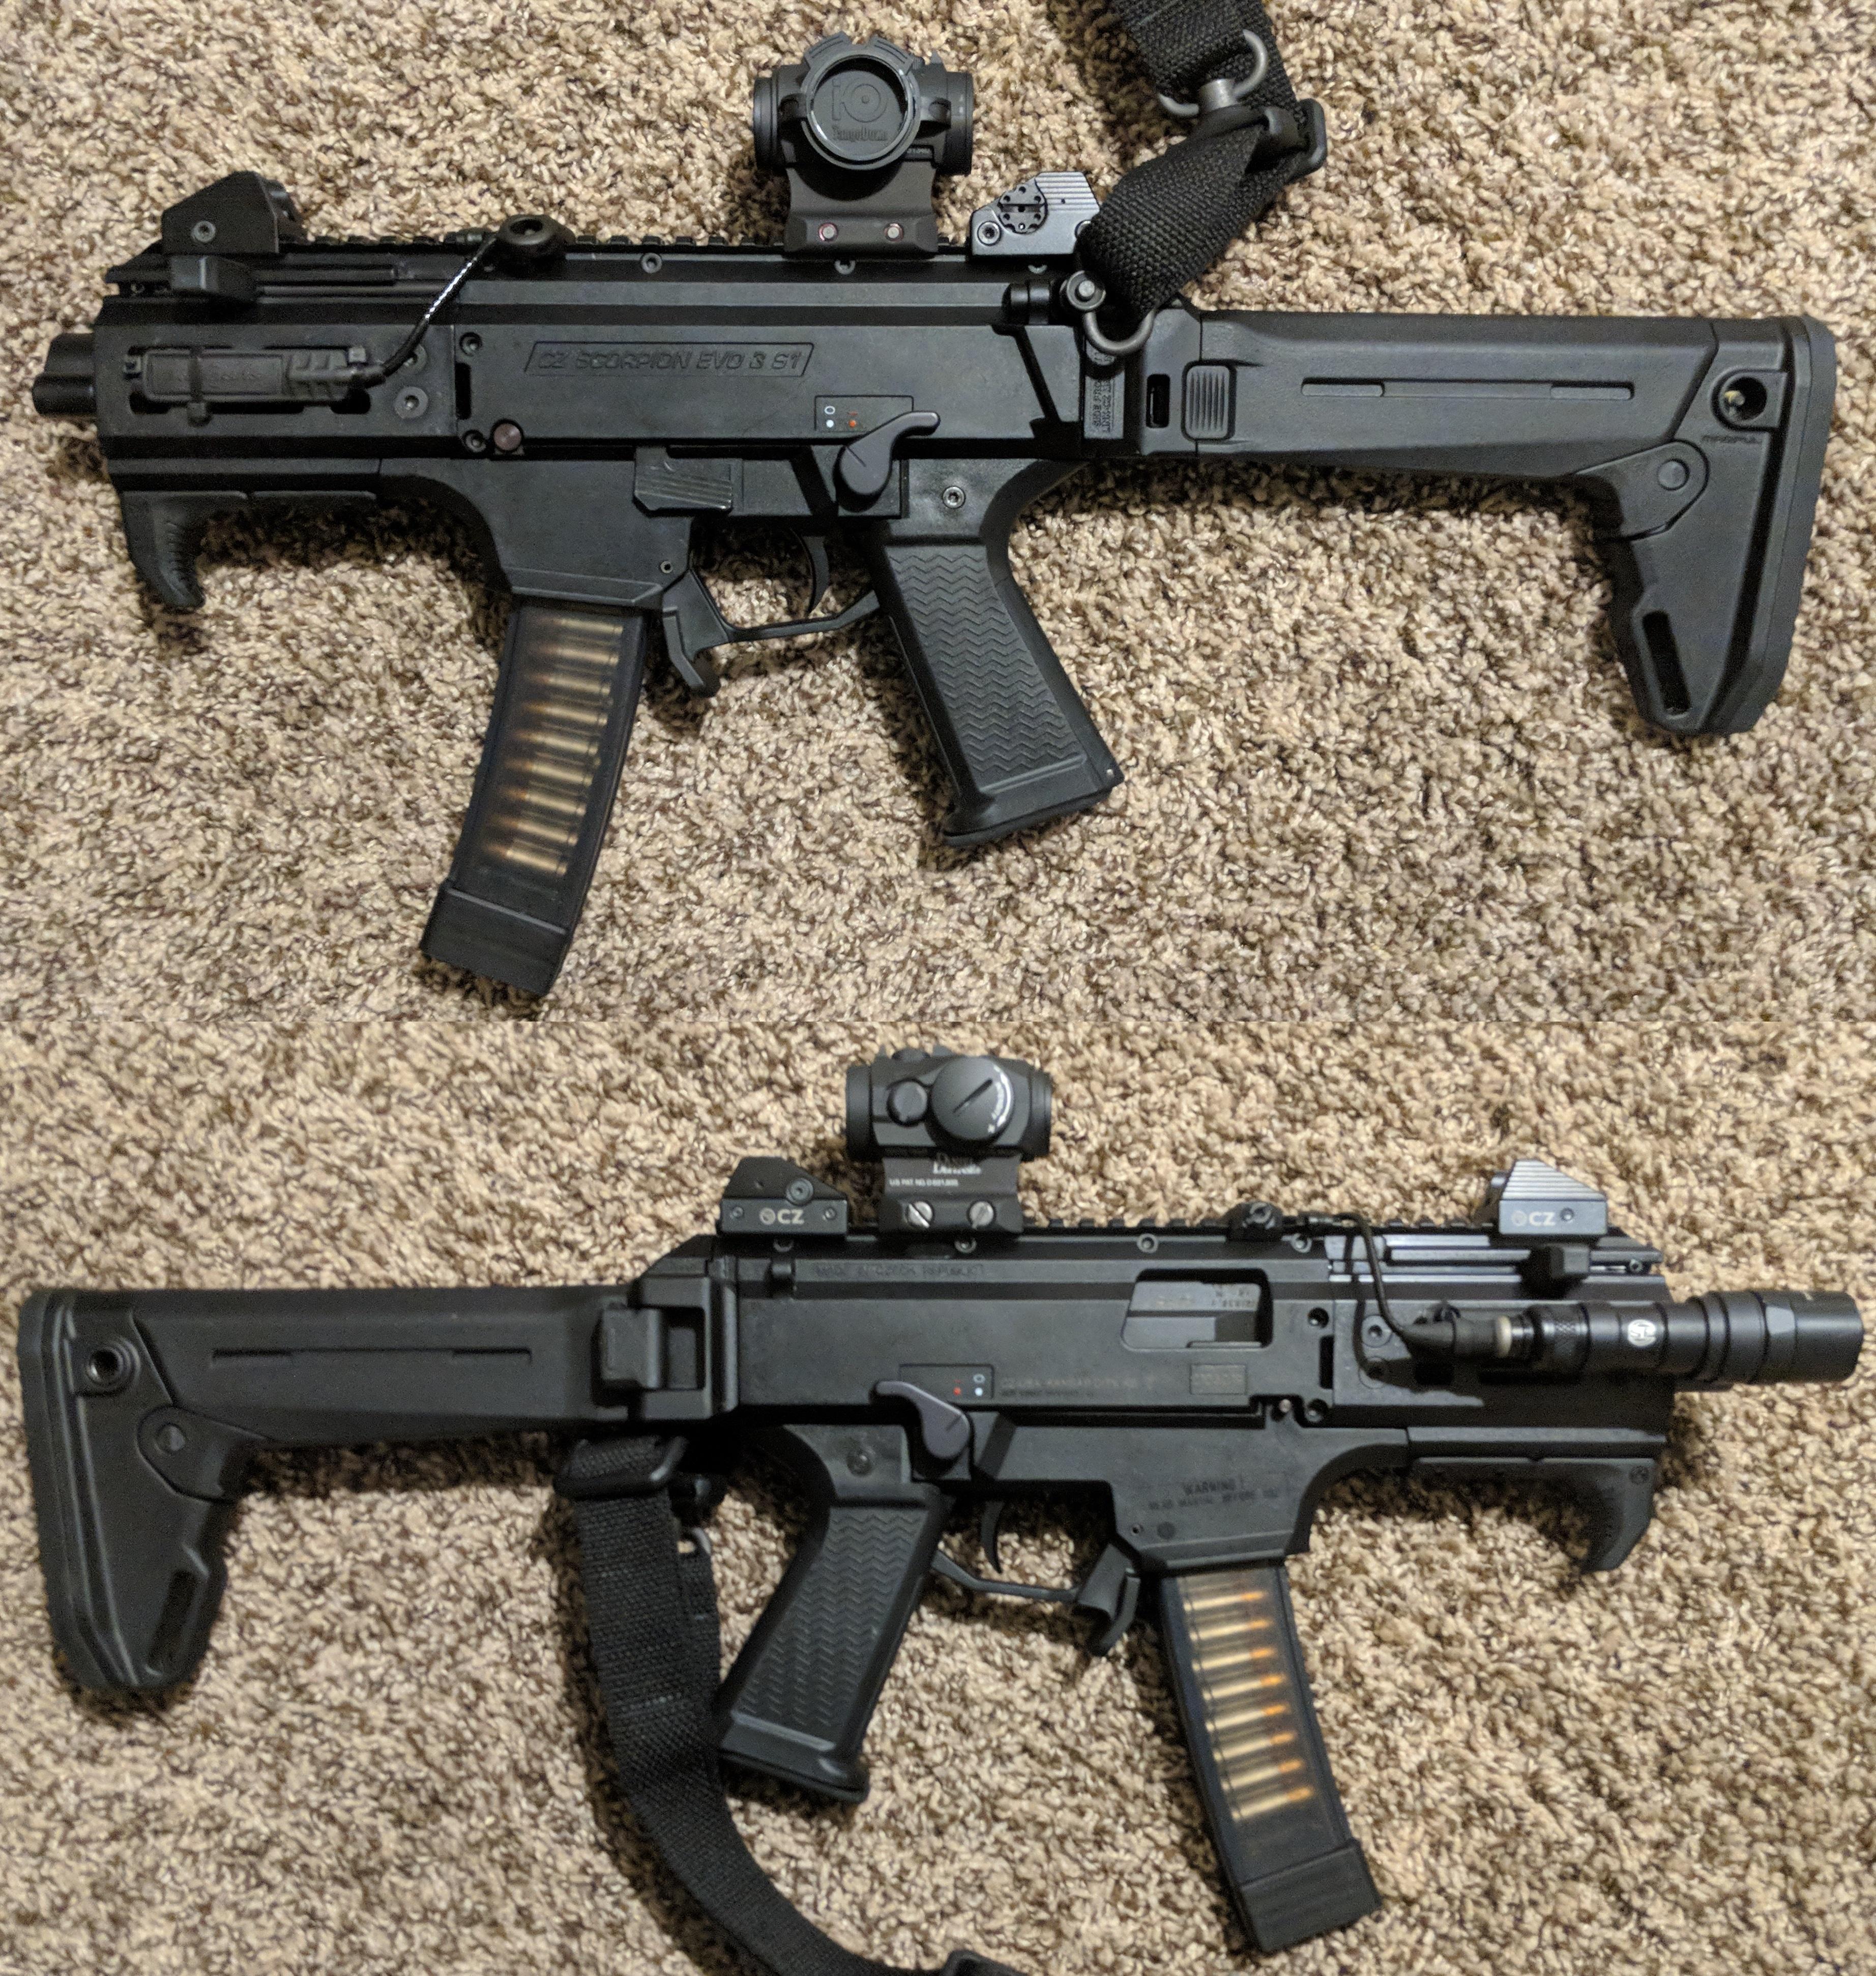 CZ Scorpion Evo thread [Archive] - pistol-forum com